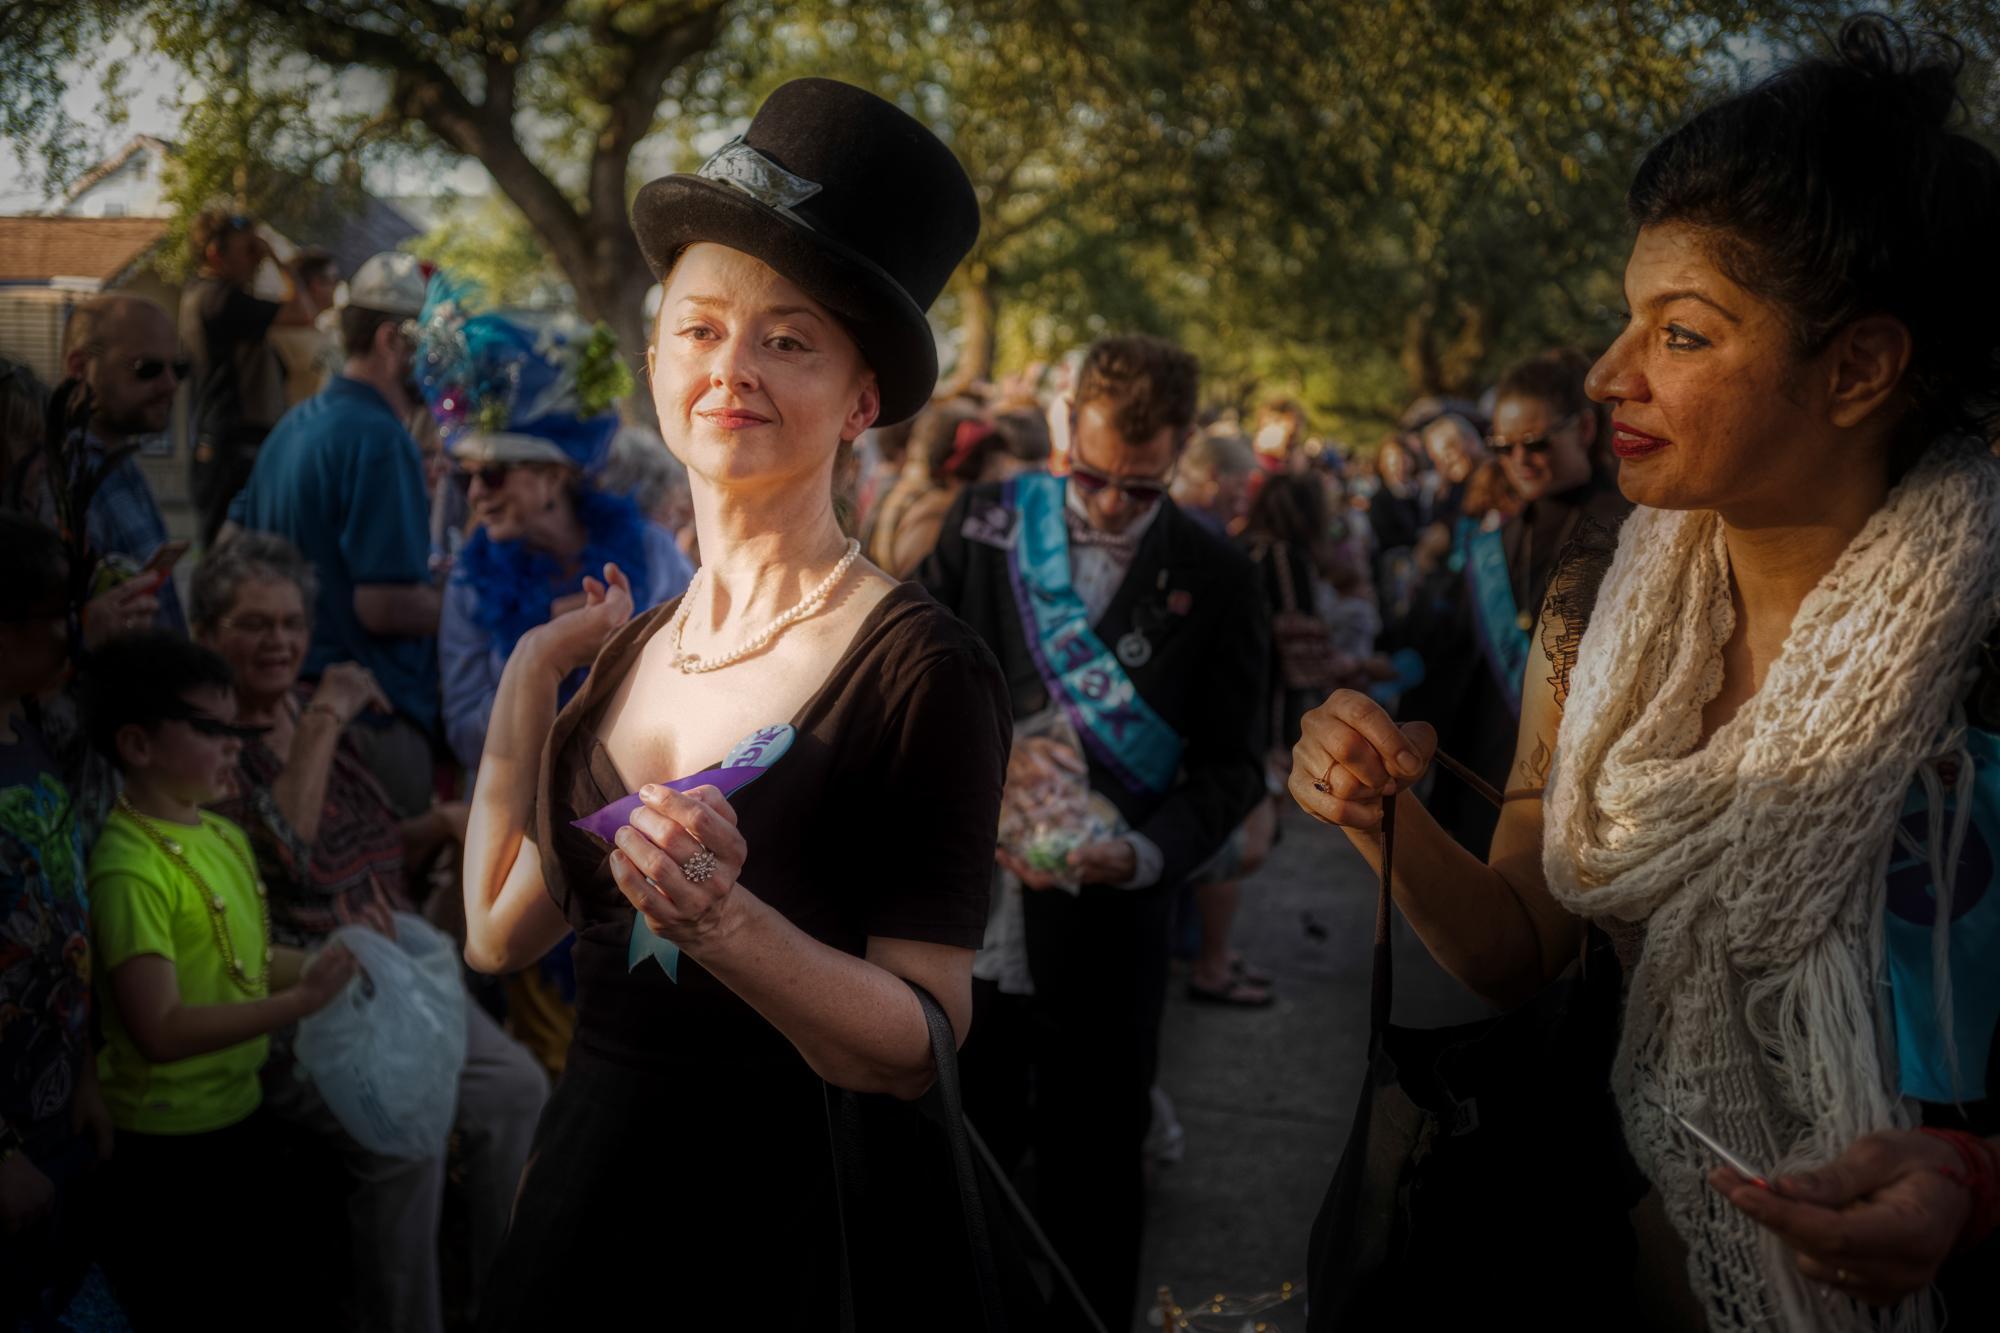 'tit Rex Mardi Gras Parade, Marigny New Orleans, LA - 2019